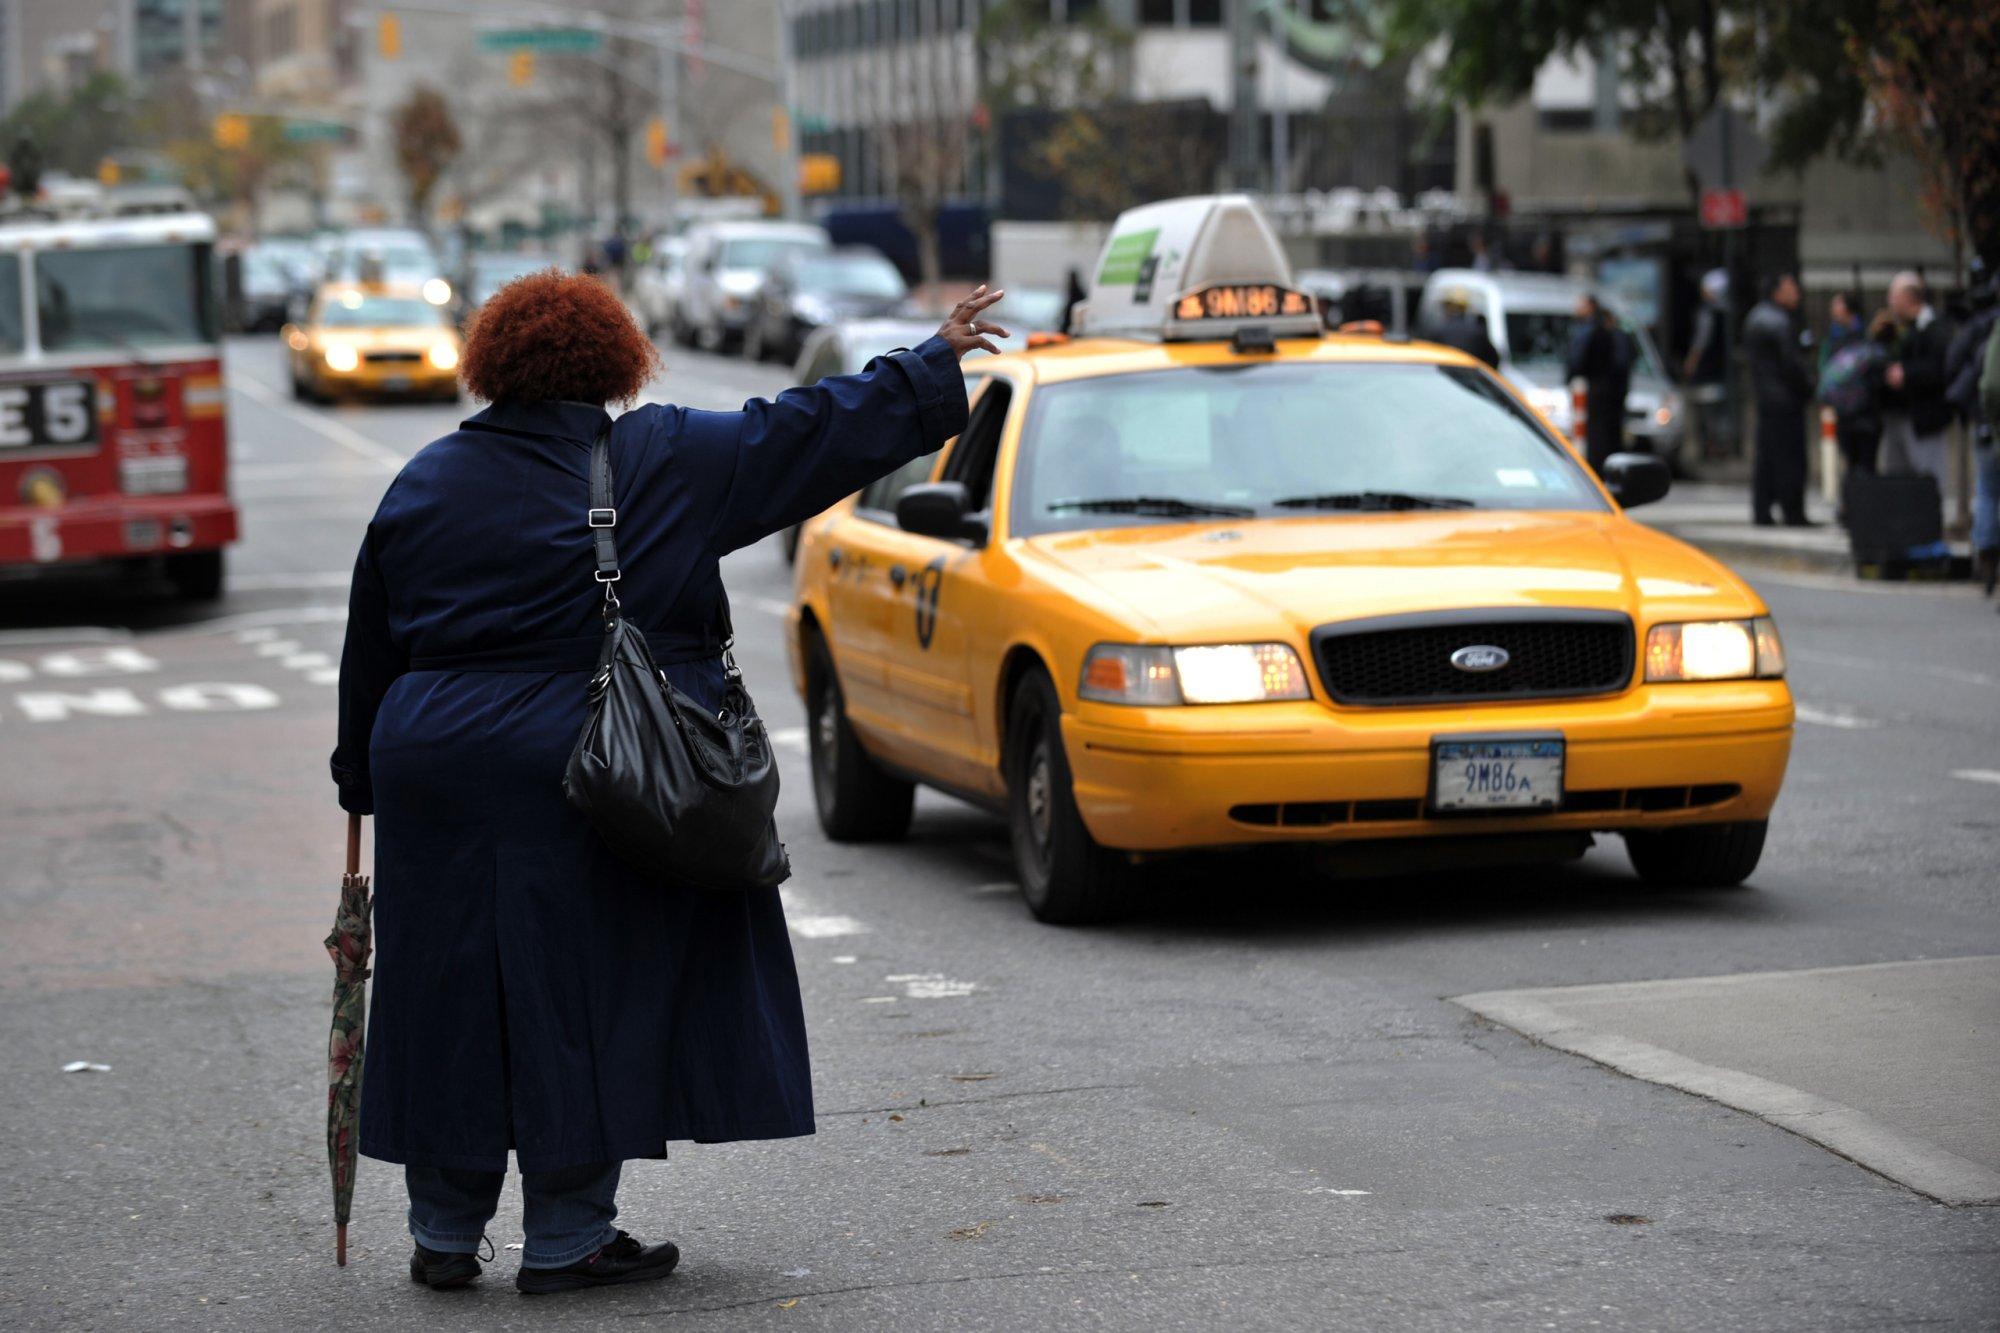 Taksi_Cagirma